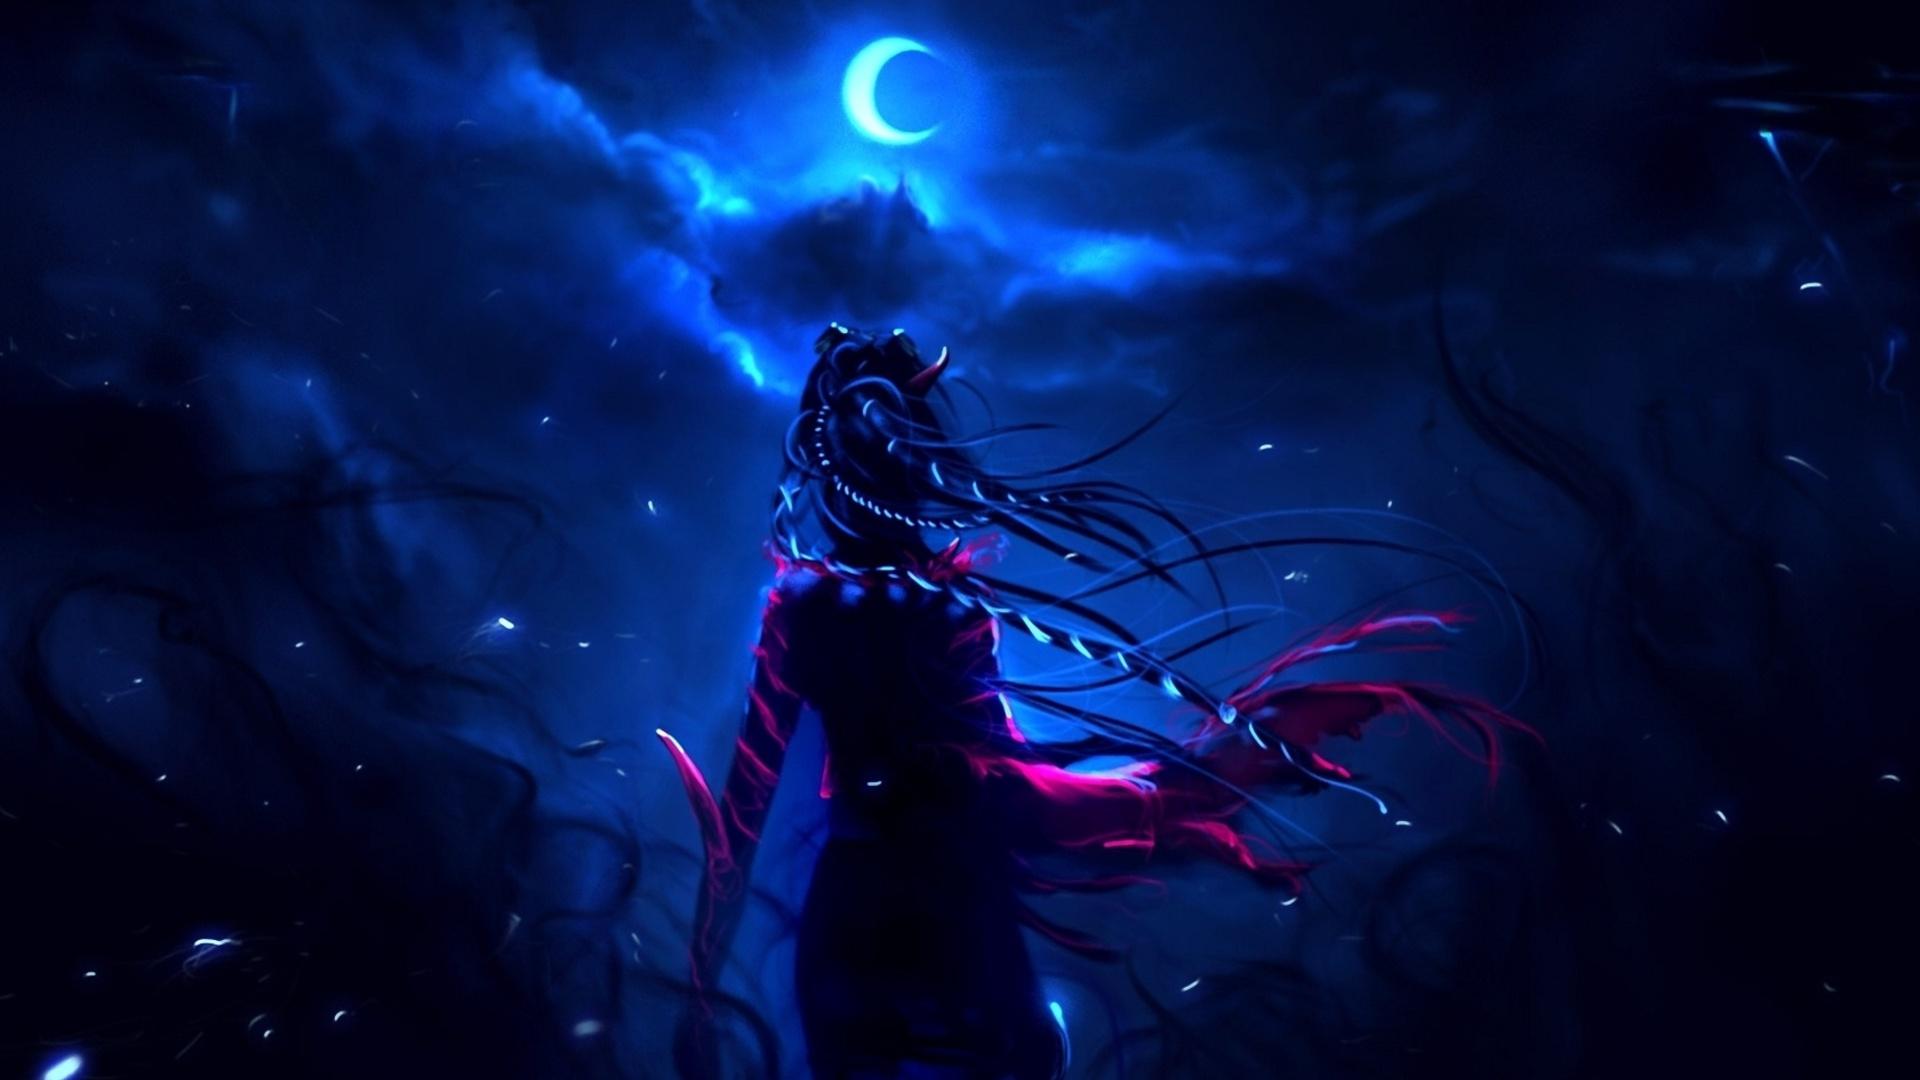 fantasy dark horror art witch sky wallpaper 1920x1080